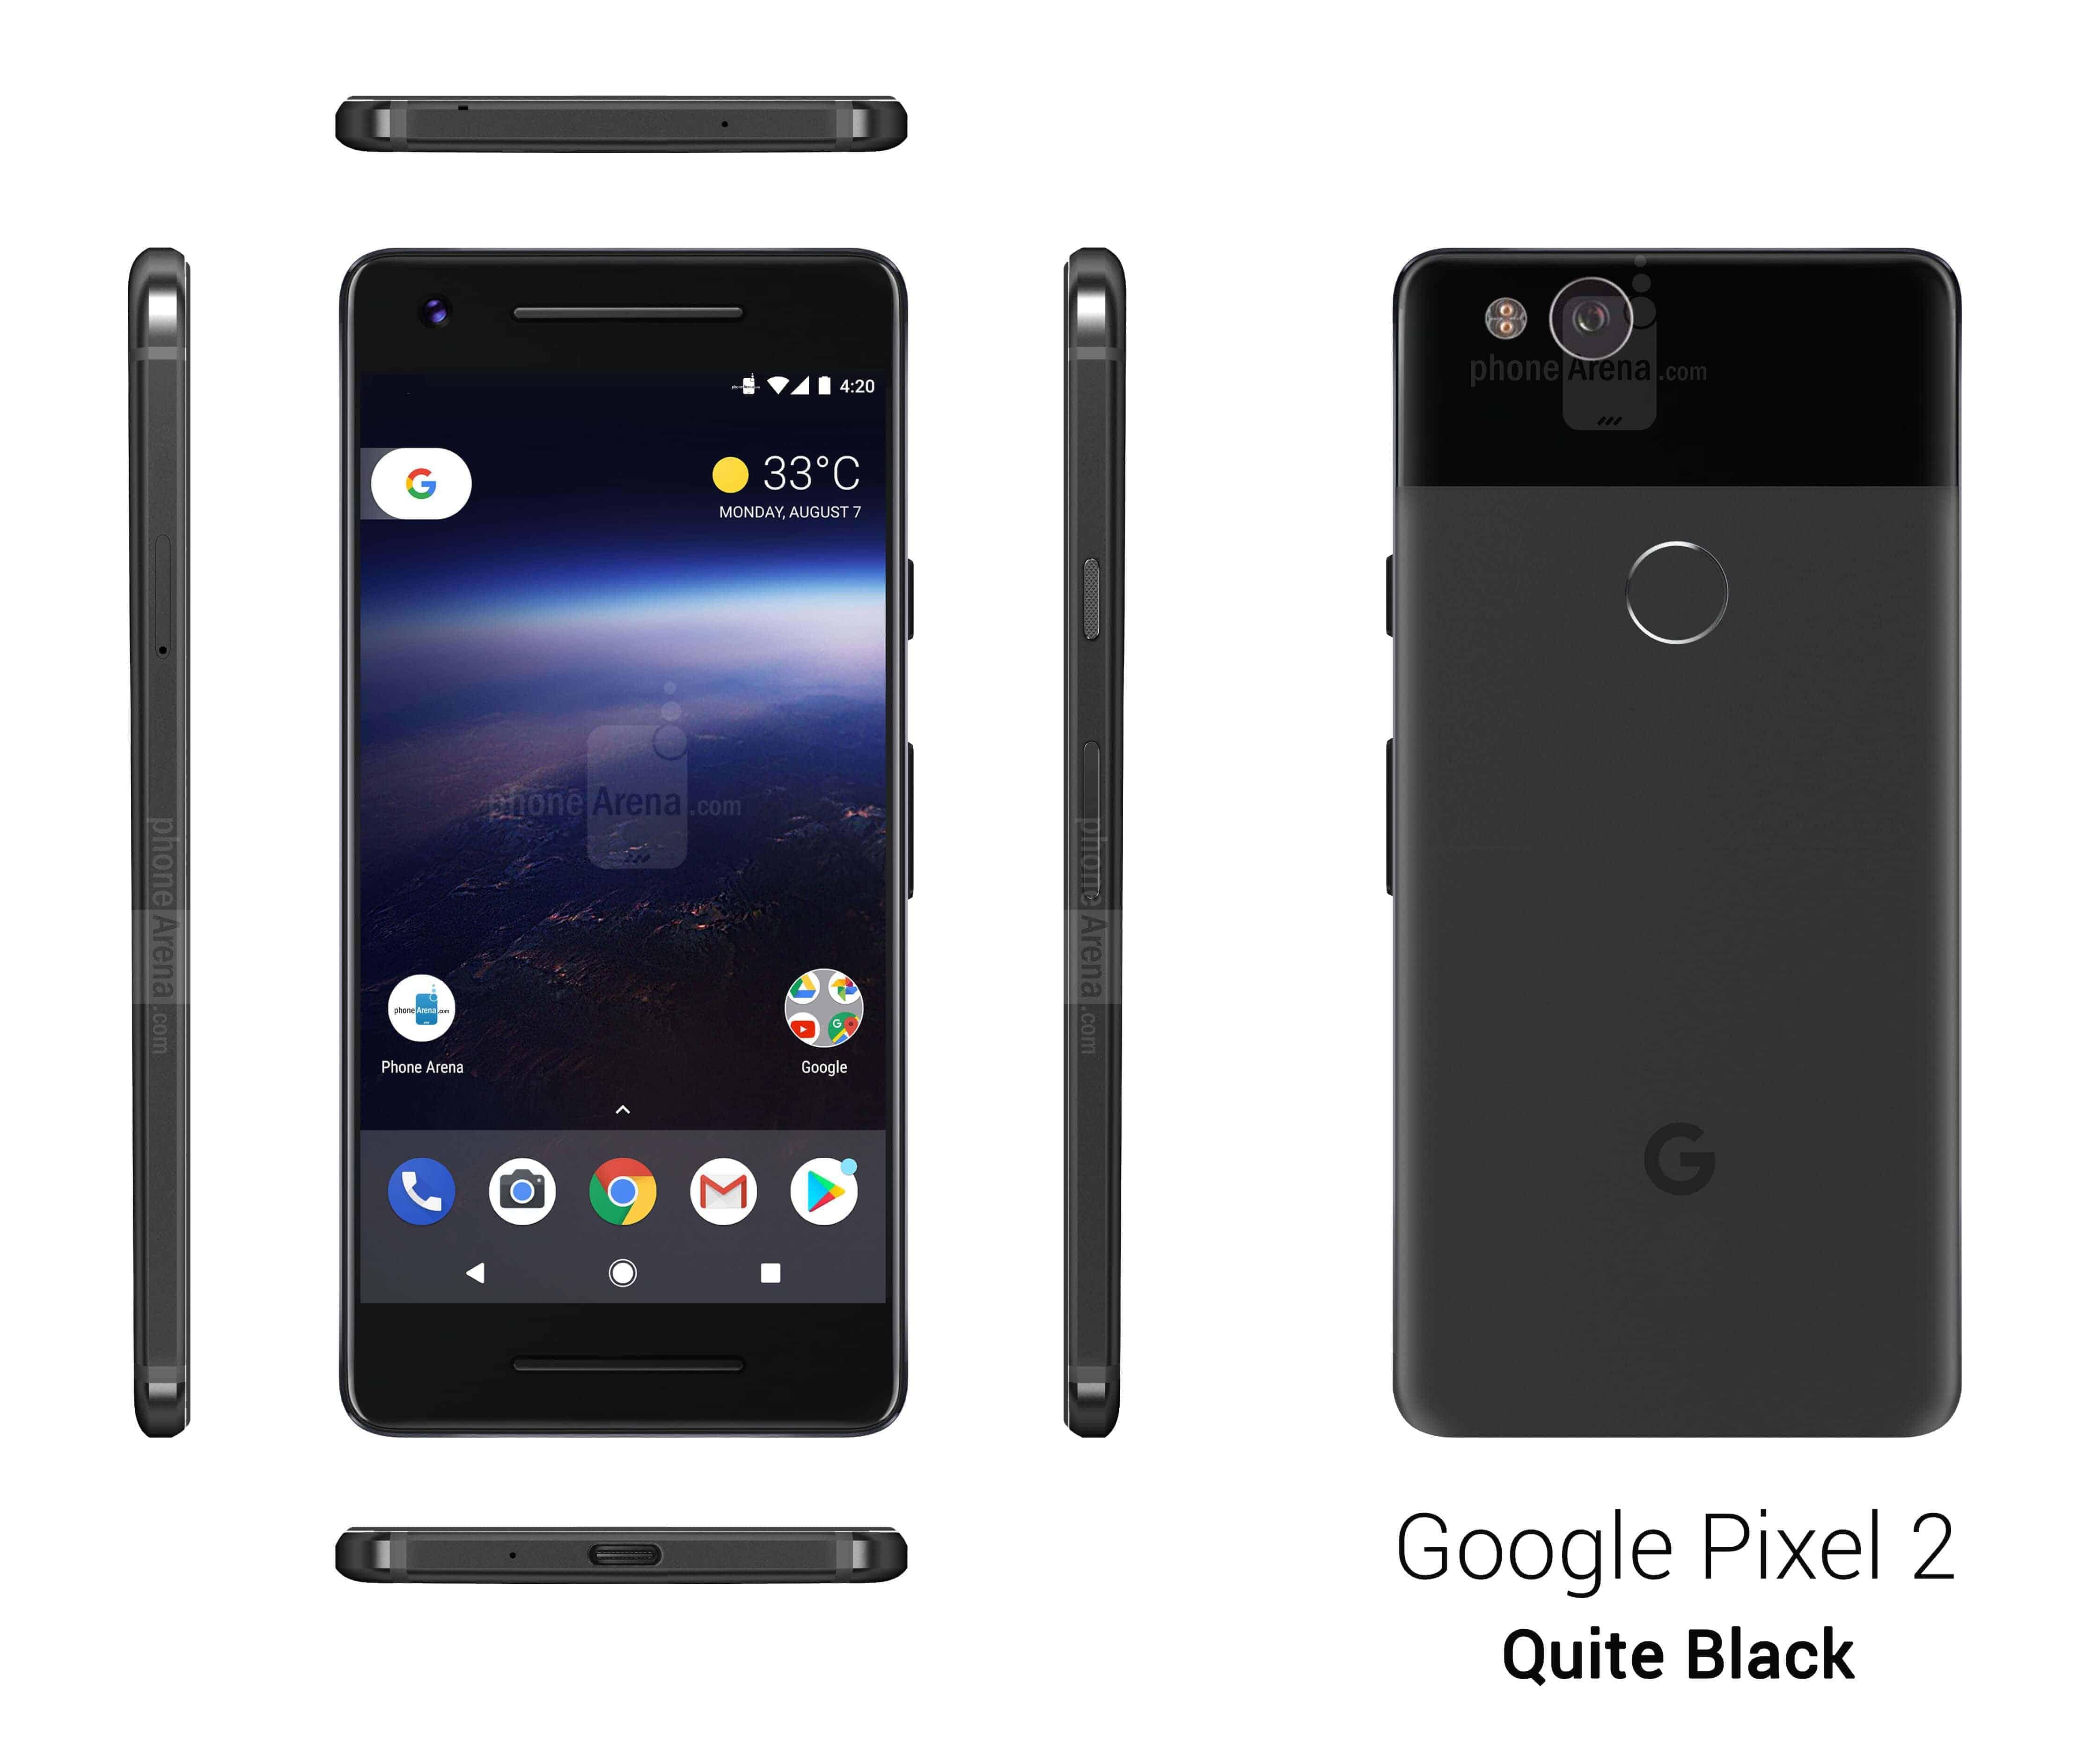 Google Pixel 2 Phone Arena Leak 2